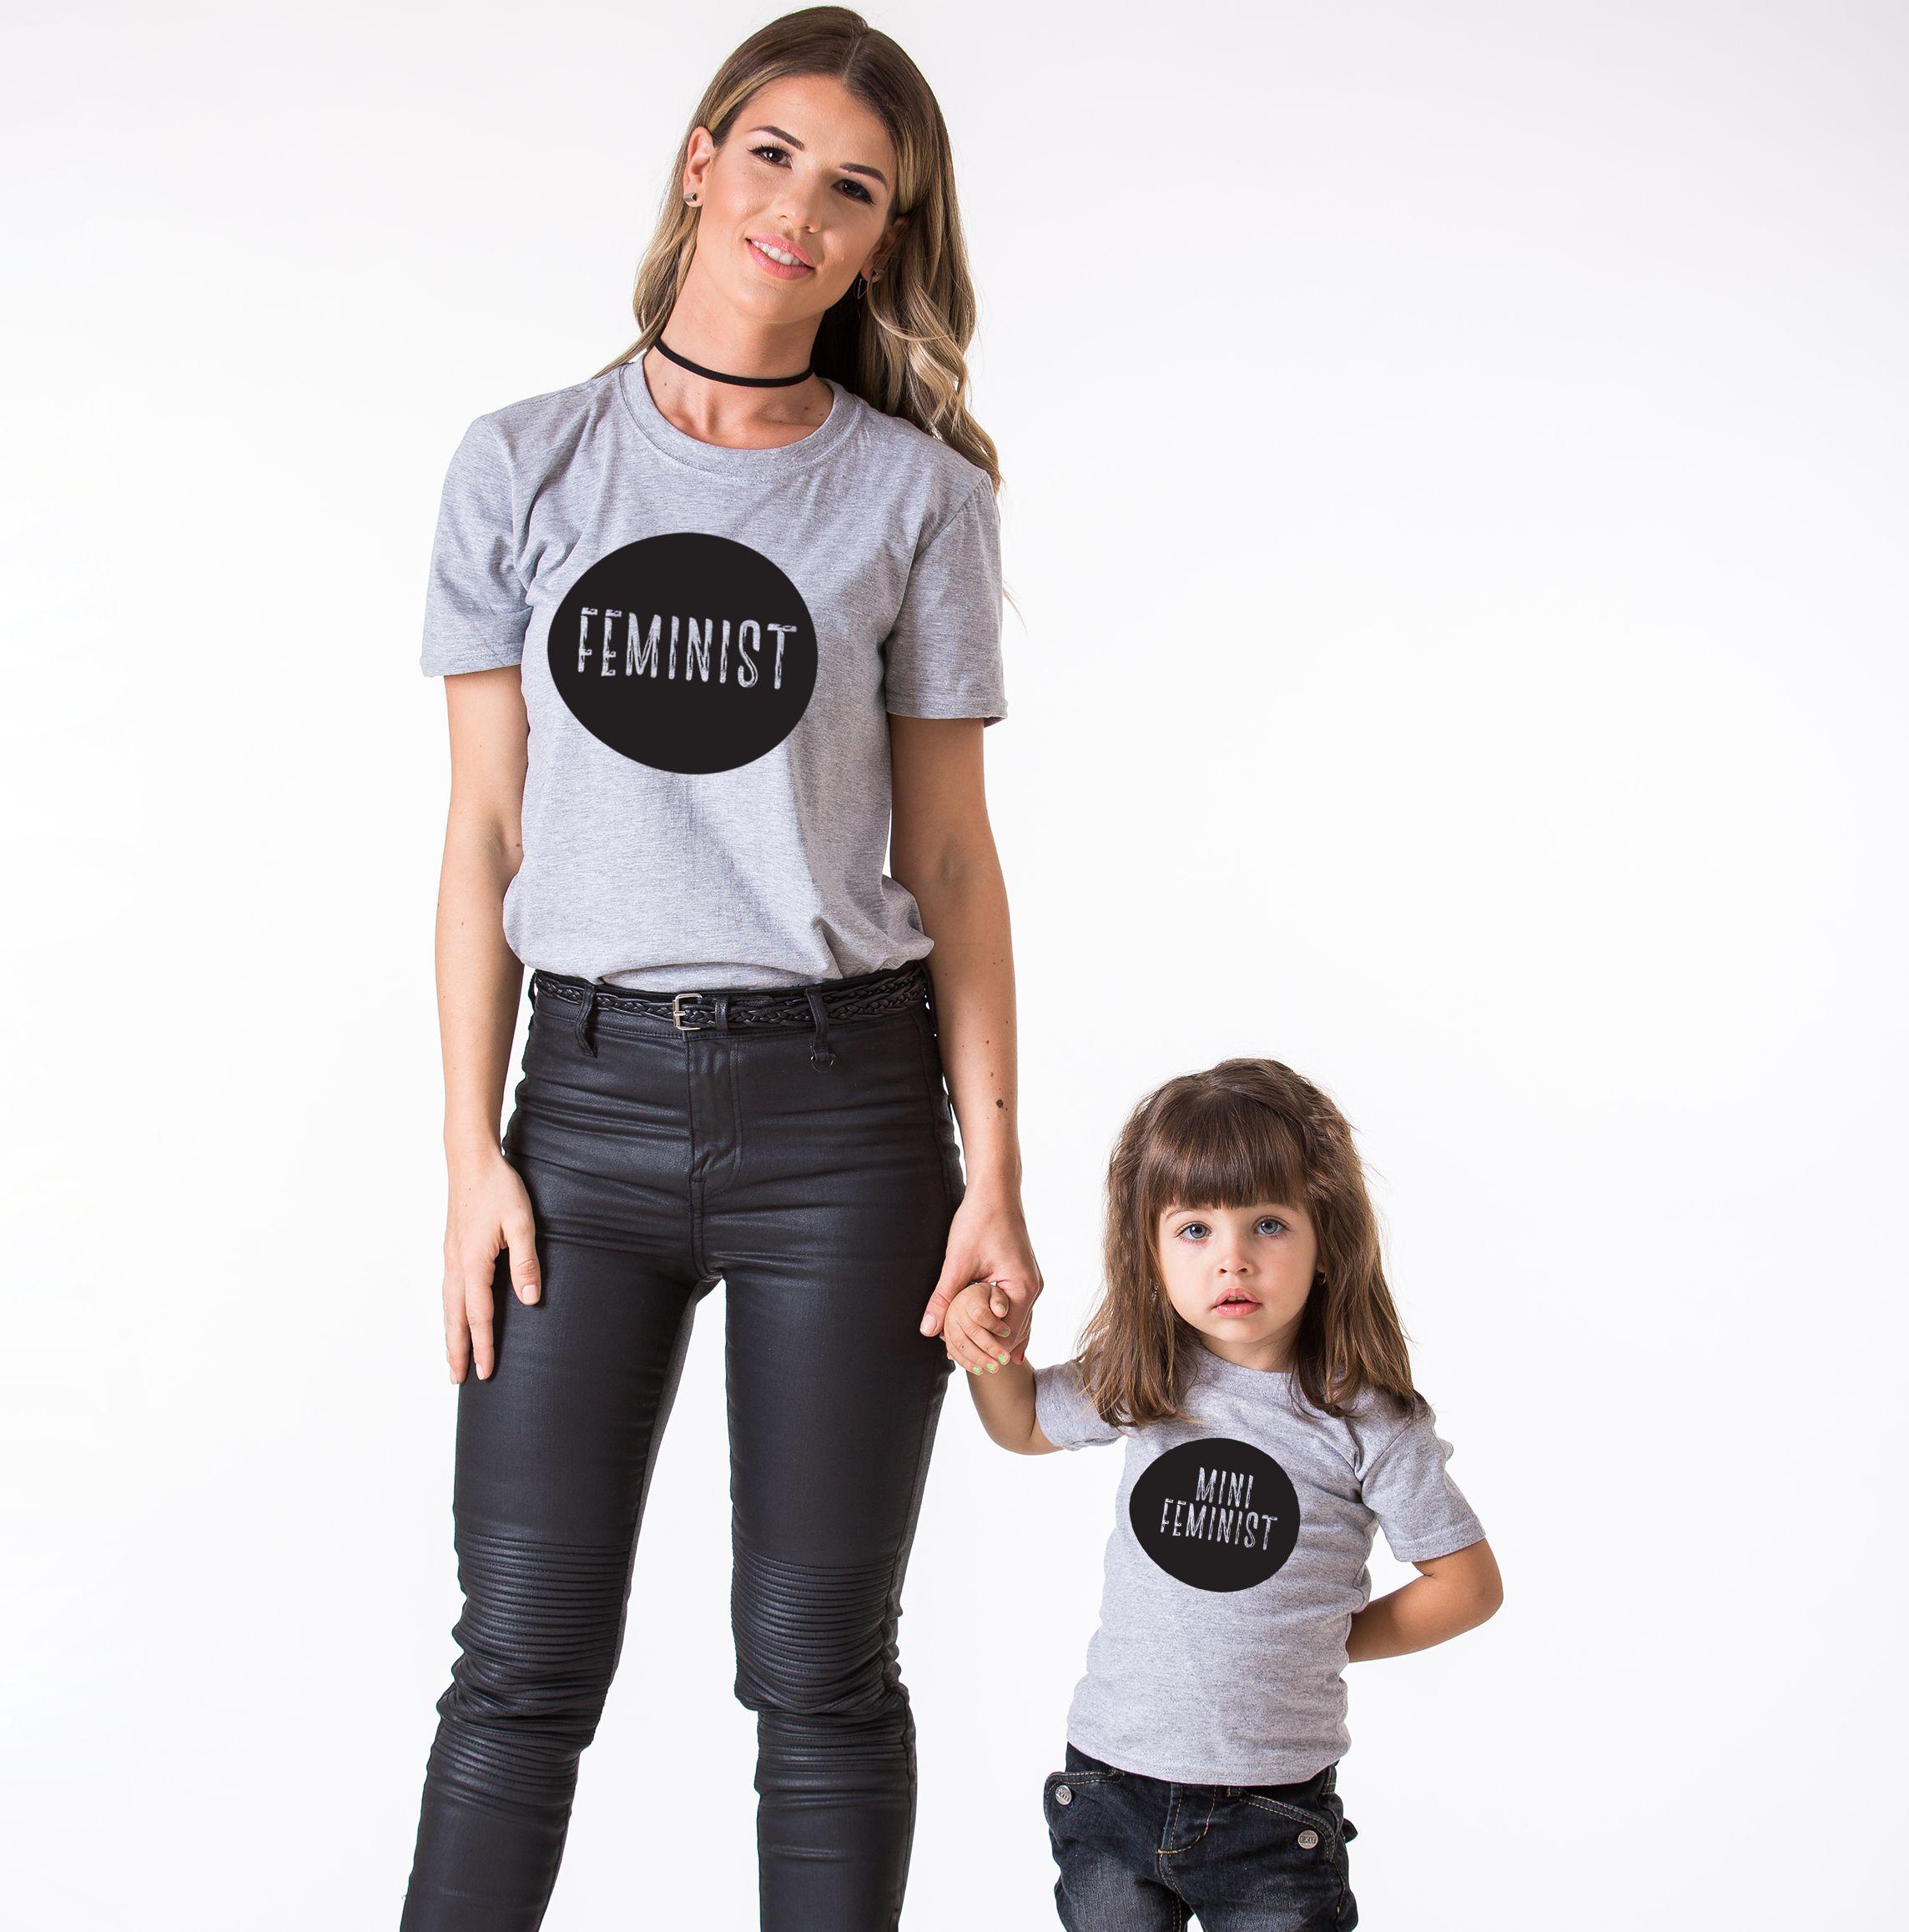 Feminist Mini Feminist Shirts Matching Mommy And Me Shirts